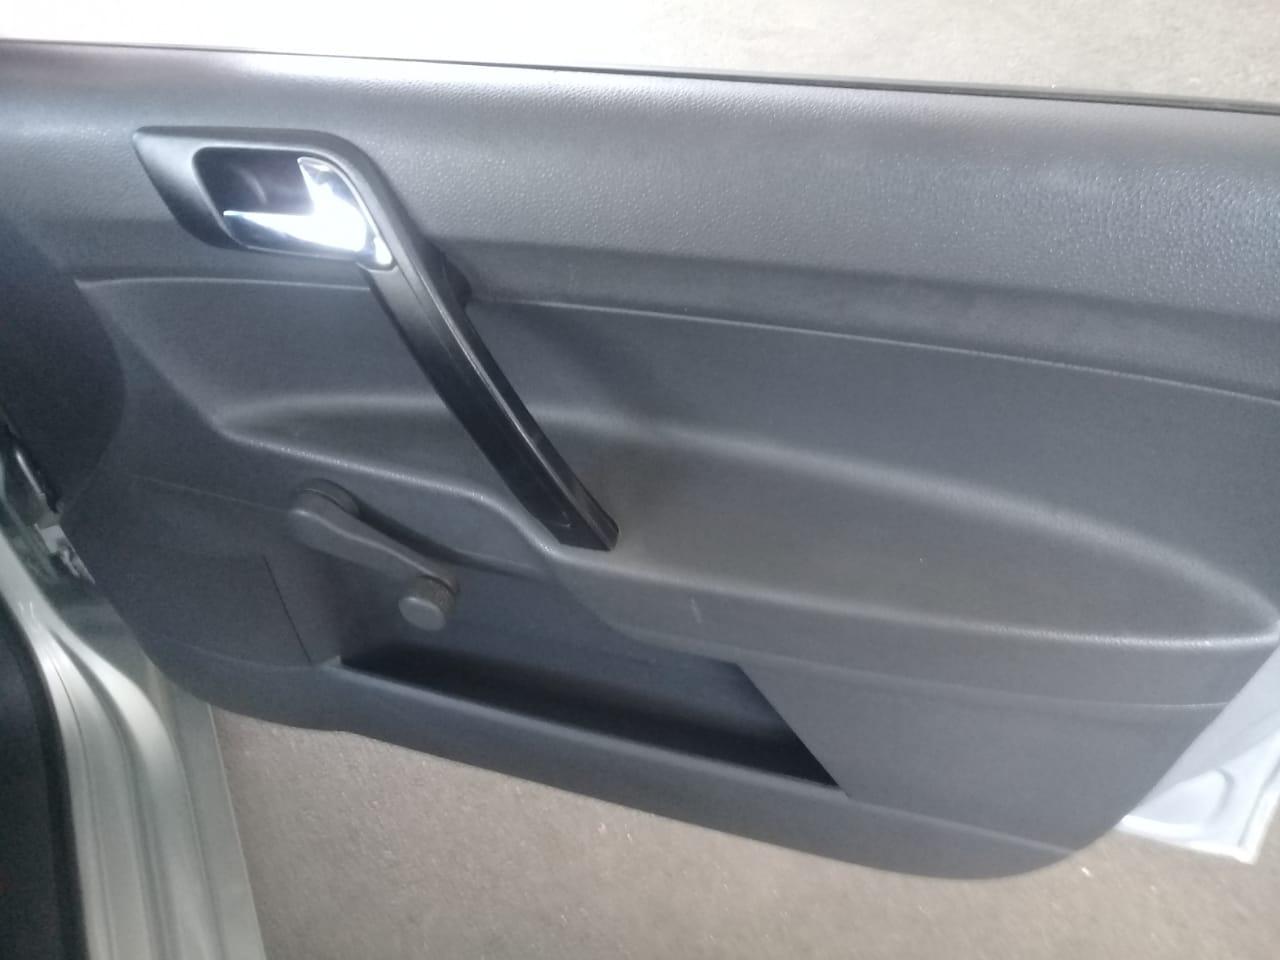 VW Polo 1.4 Comfortline